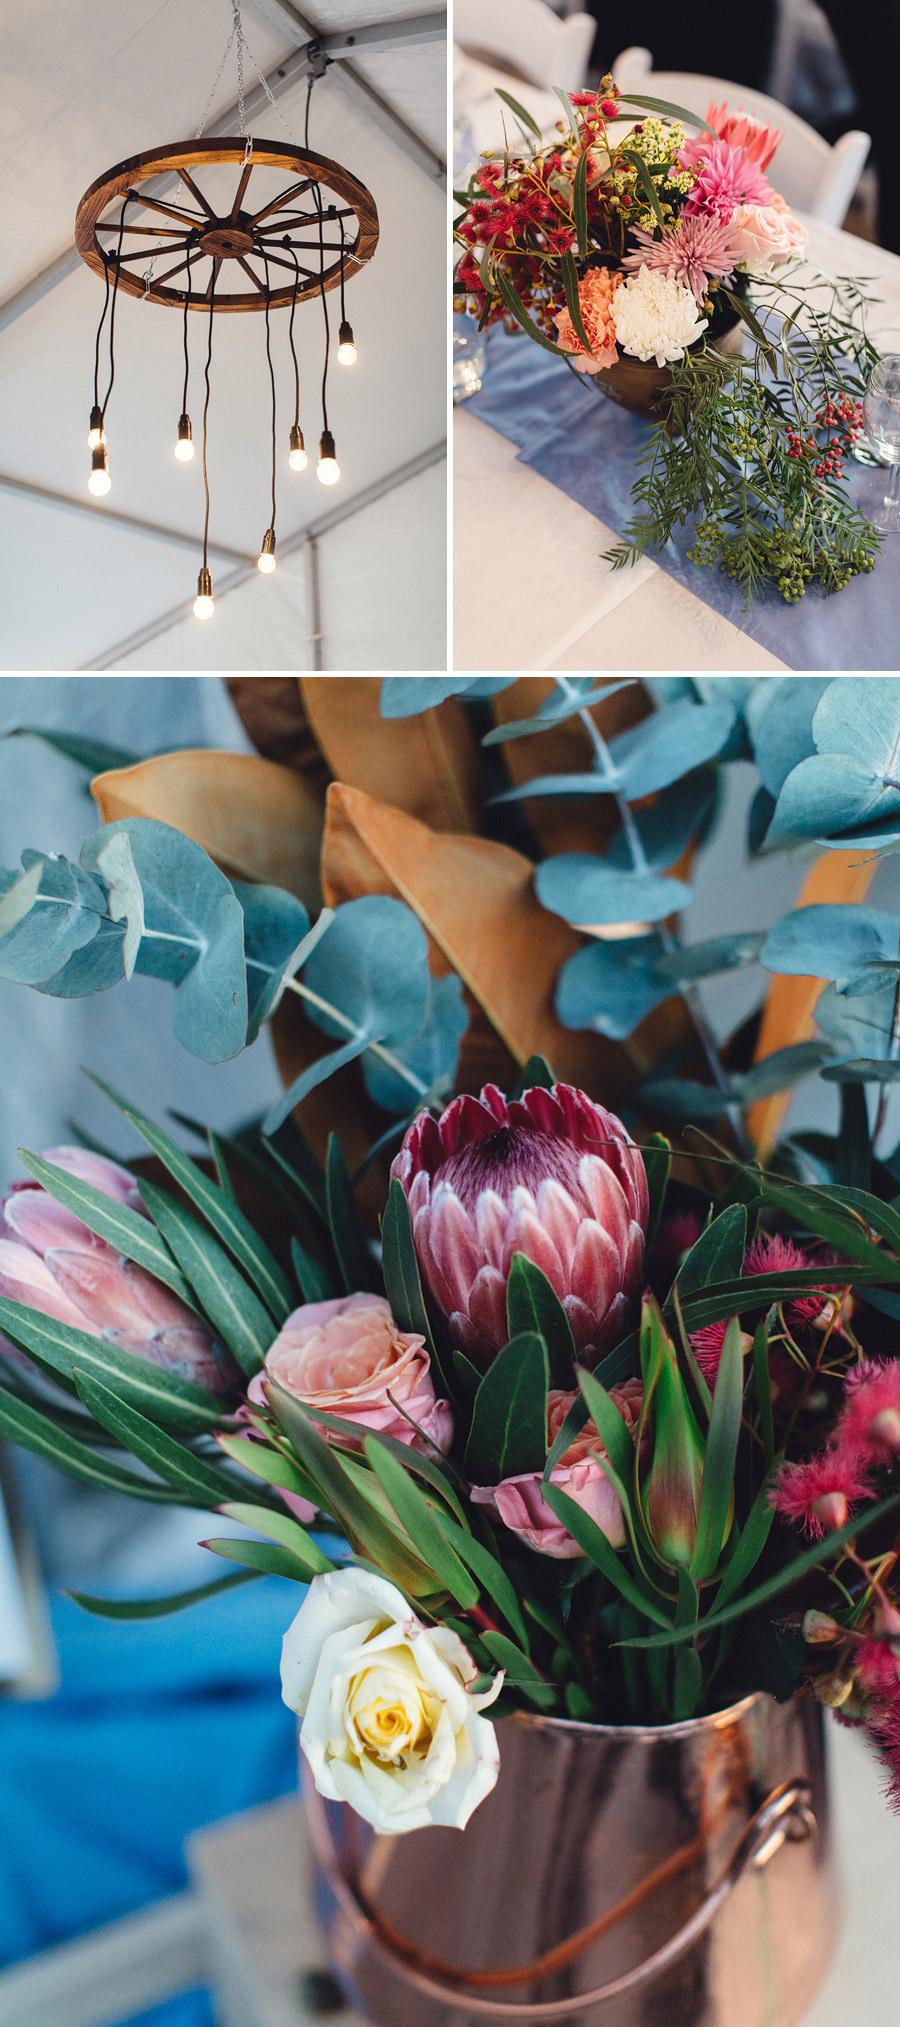 Avalon Wedding Photographers: Reception details